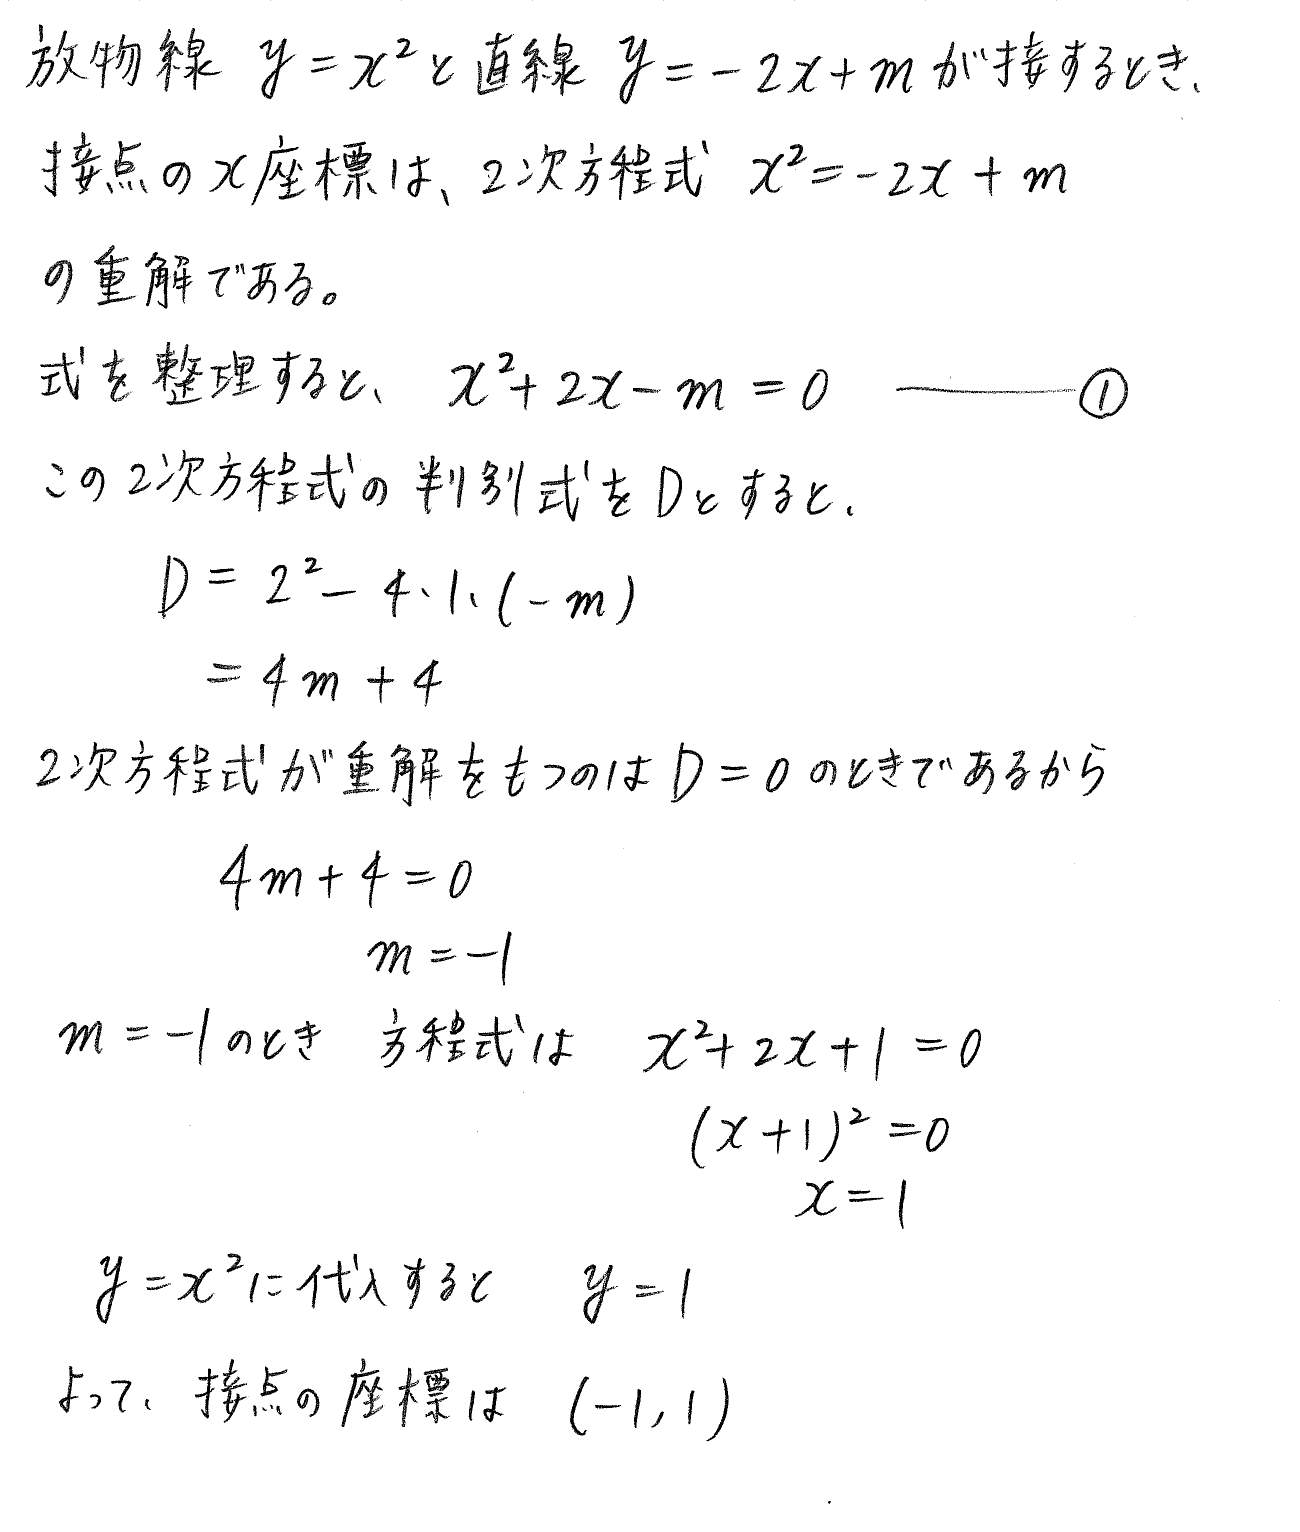 3TRIAL数学Ⅰ-198解答